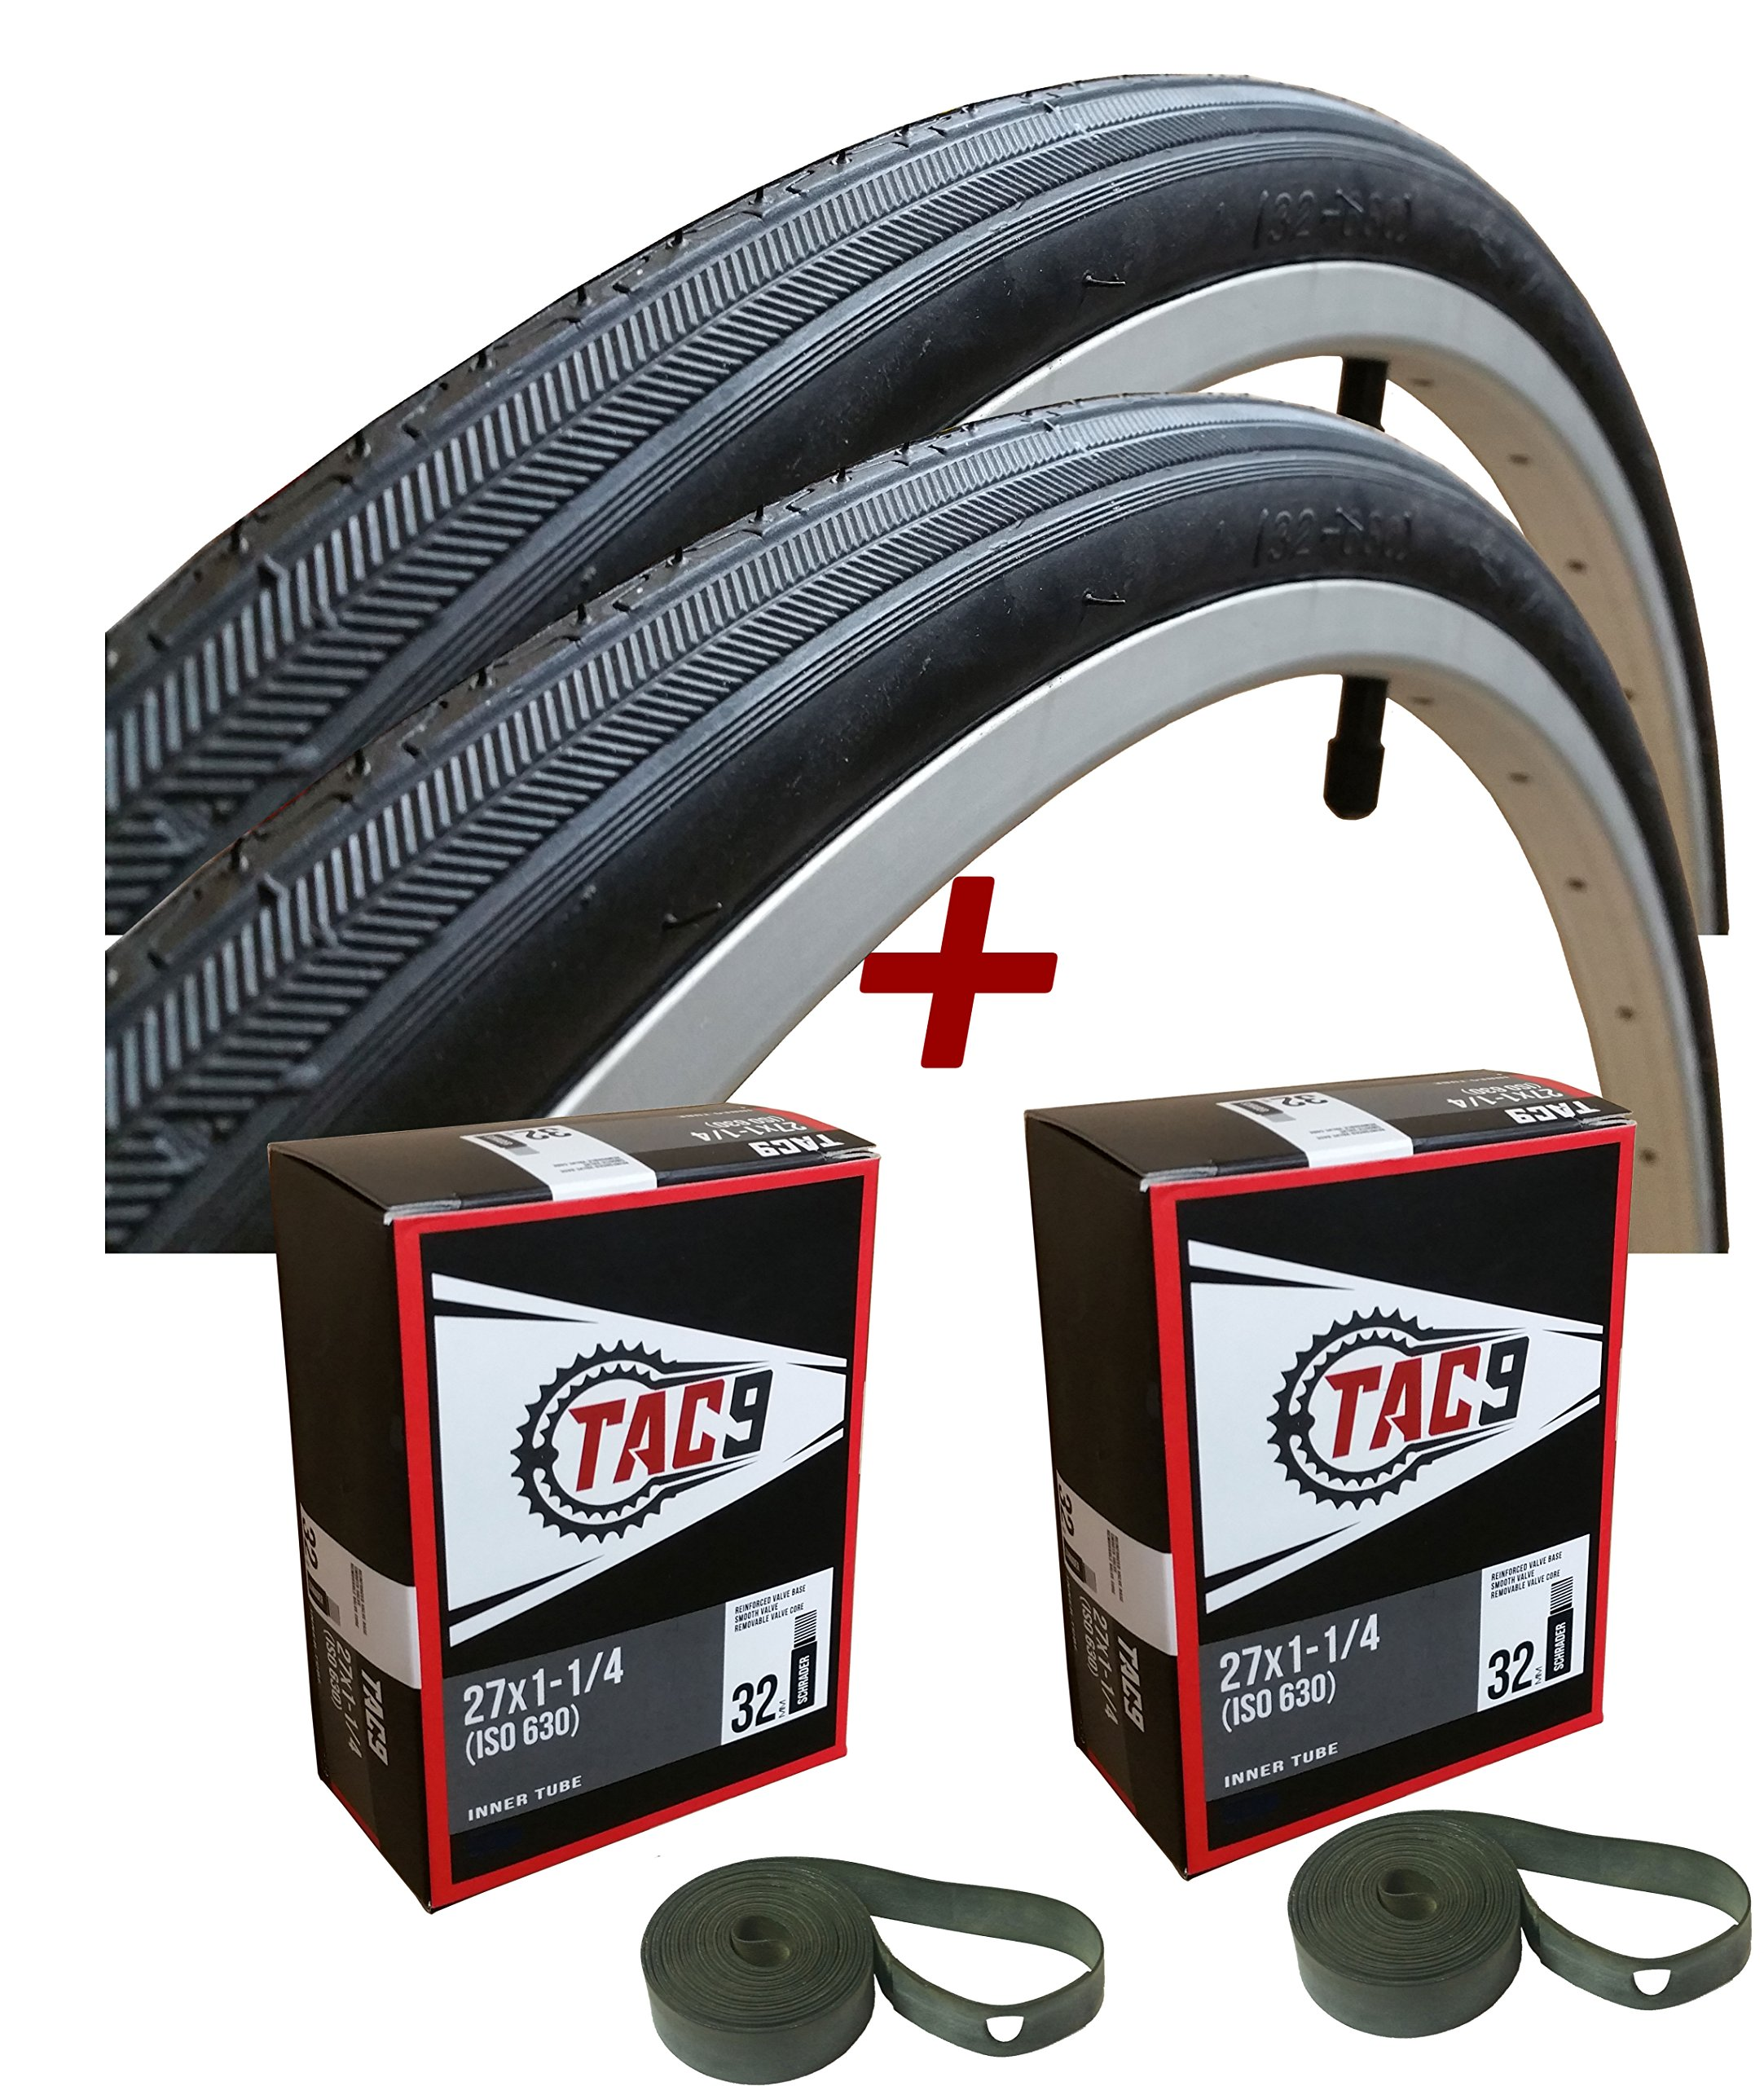 TAC 9 Two Pack - 27x1-1/4'' Bike Tire, BONUS Tube and Rim Strip - Select Gum Wall or Black Wall